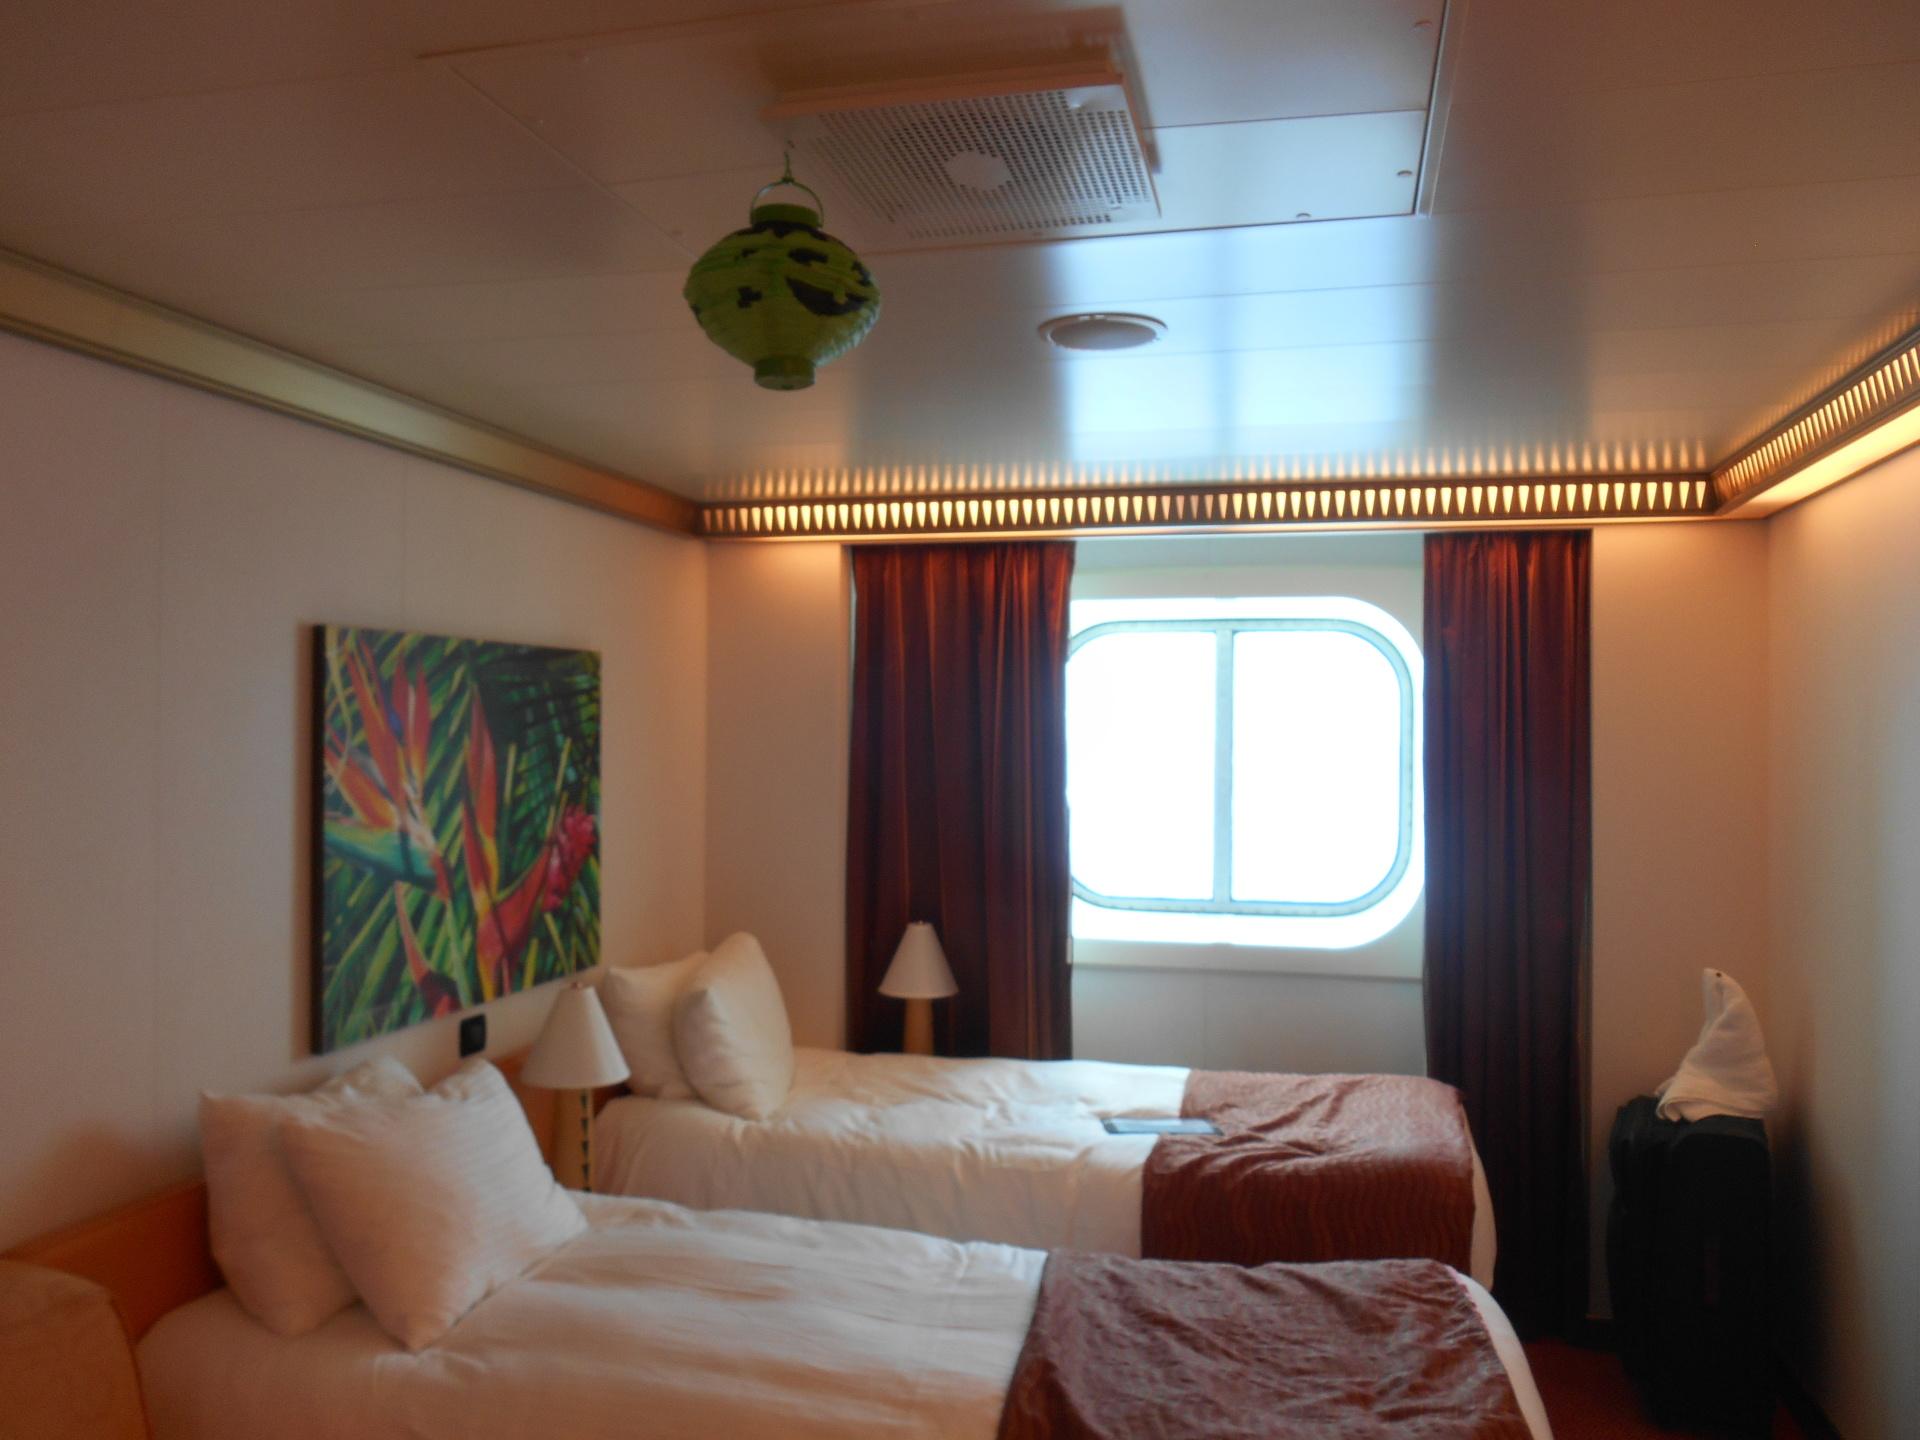 Carnival magic, deluxe ocean view cabin